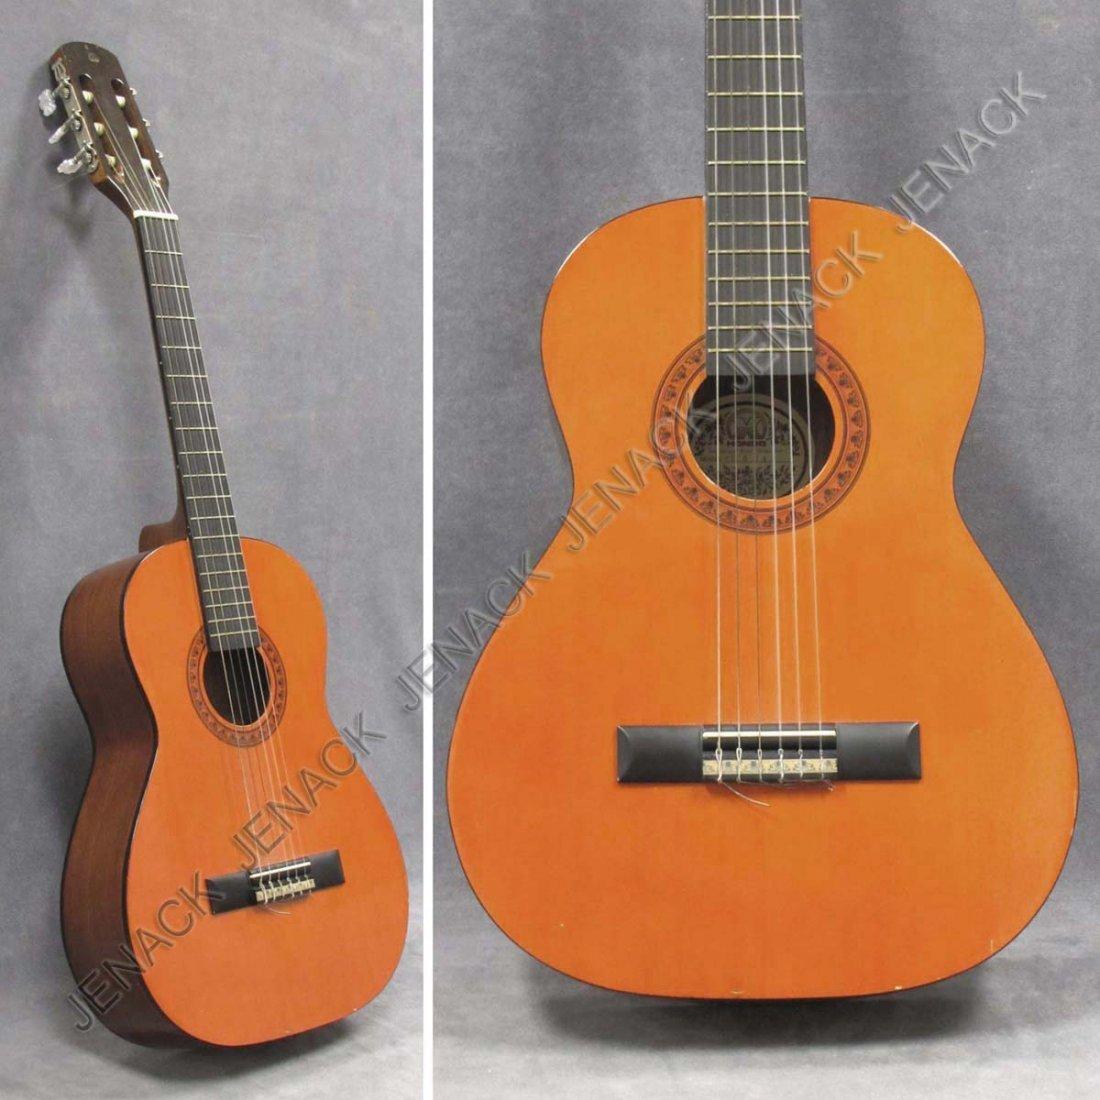 hondo classical folk guitar model a 624 with case